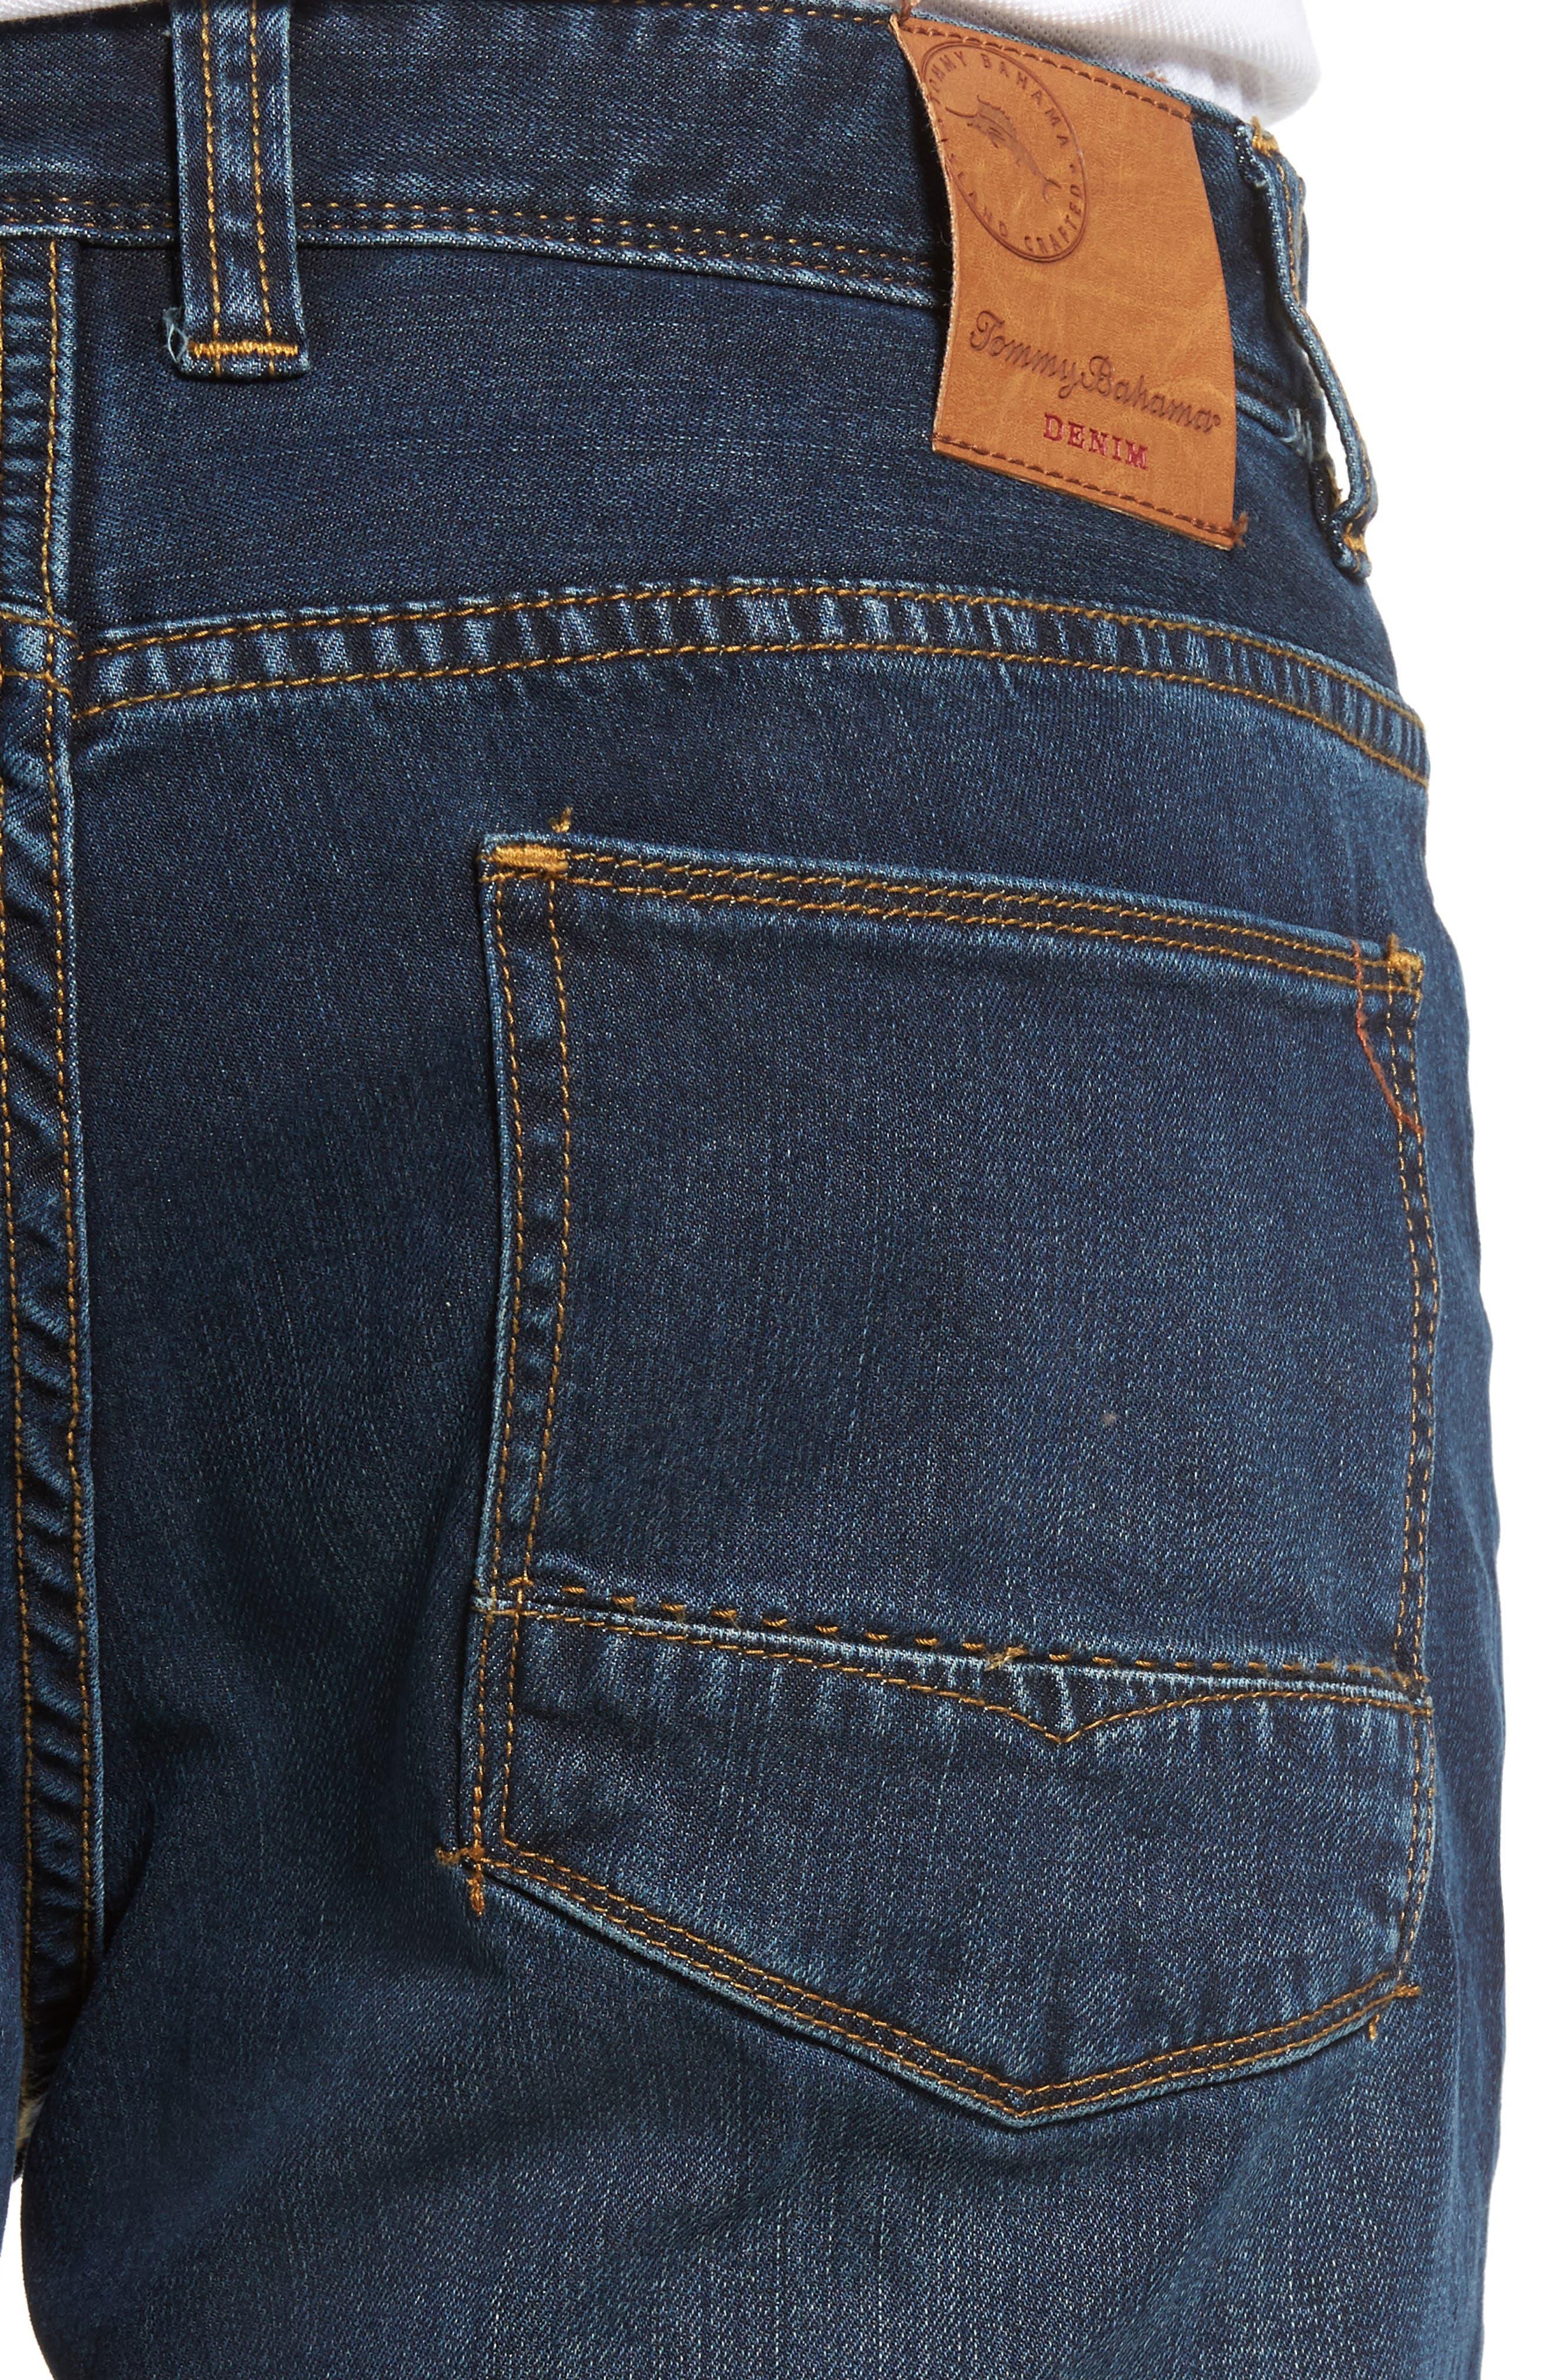 Straight Leg Jeans,                             Alternate thumbnail 4, color,                             400